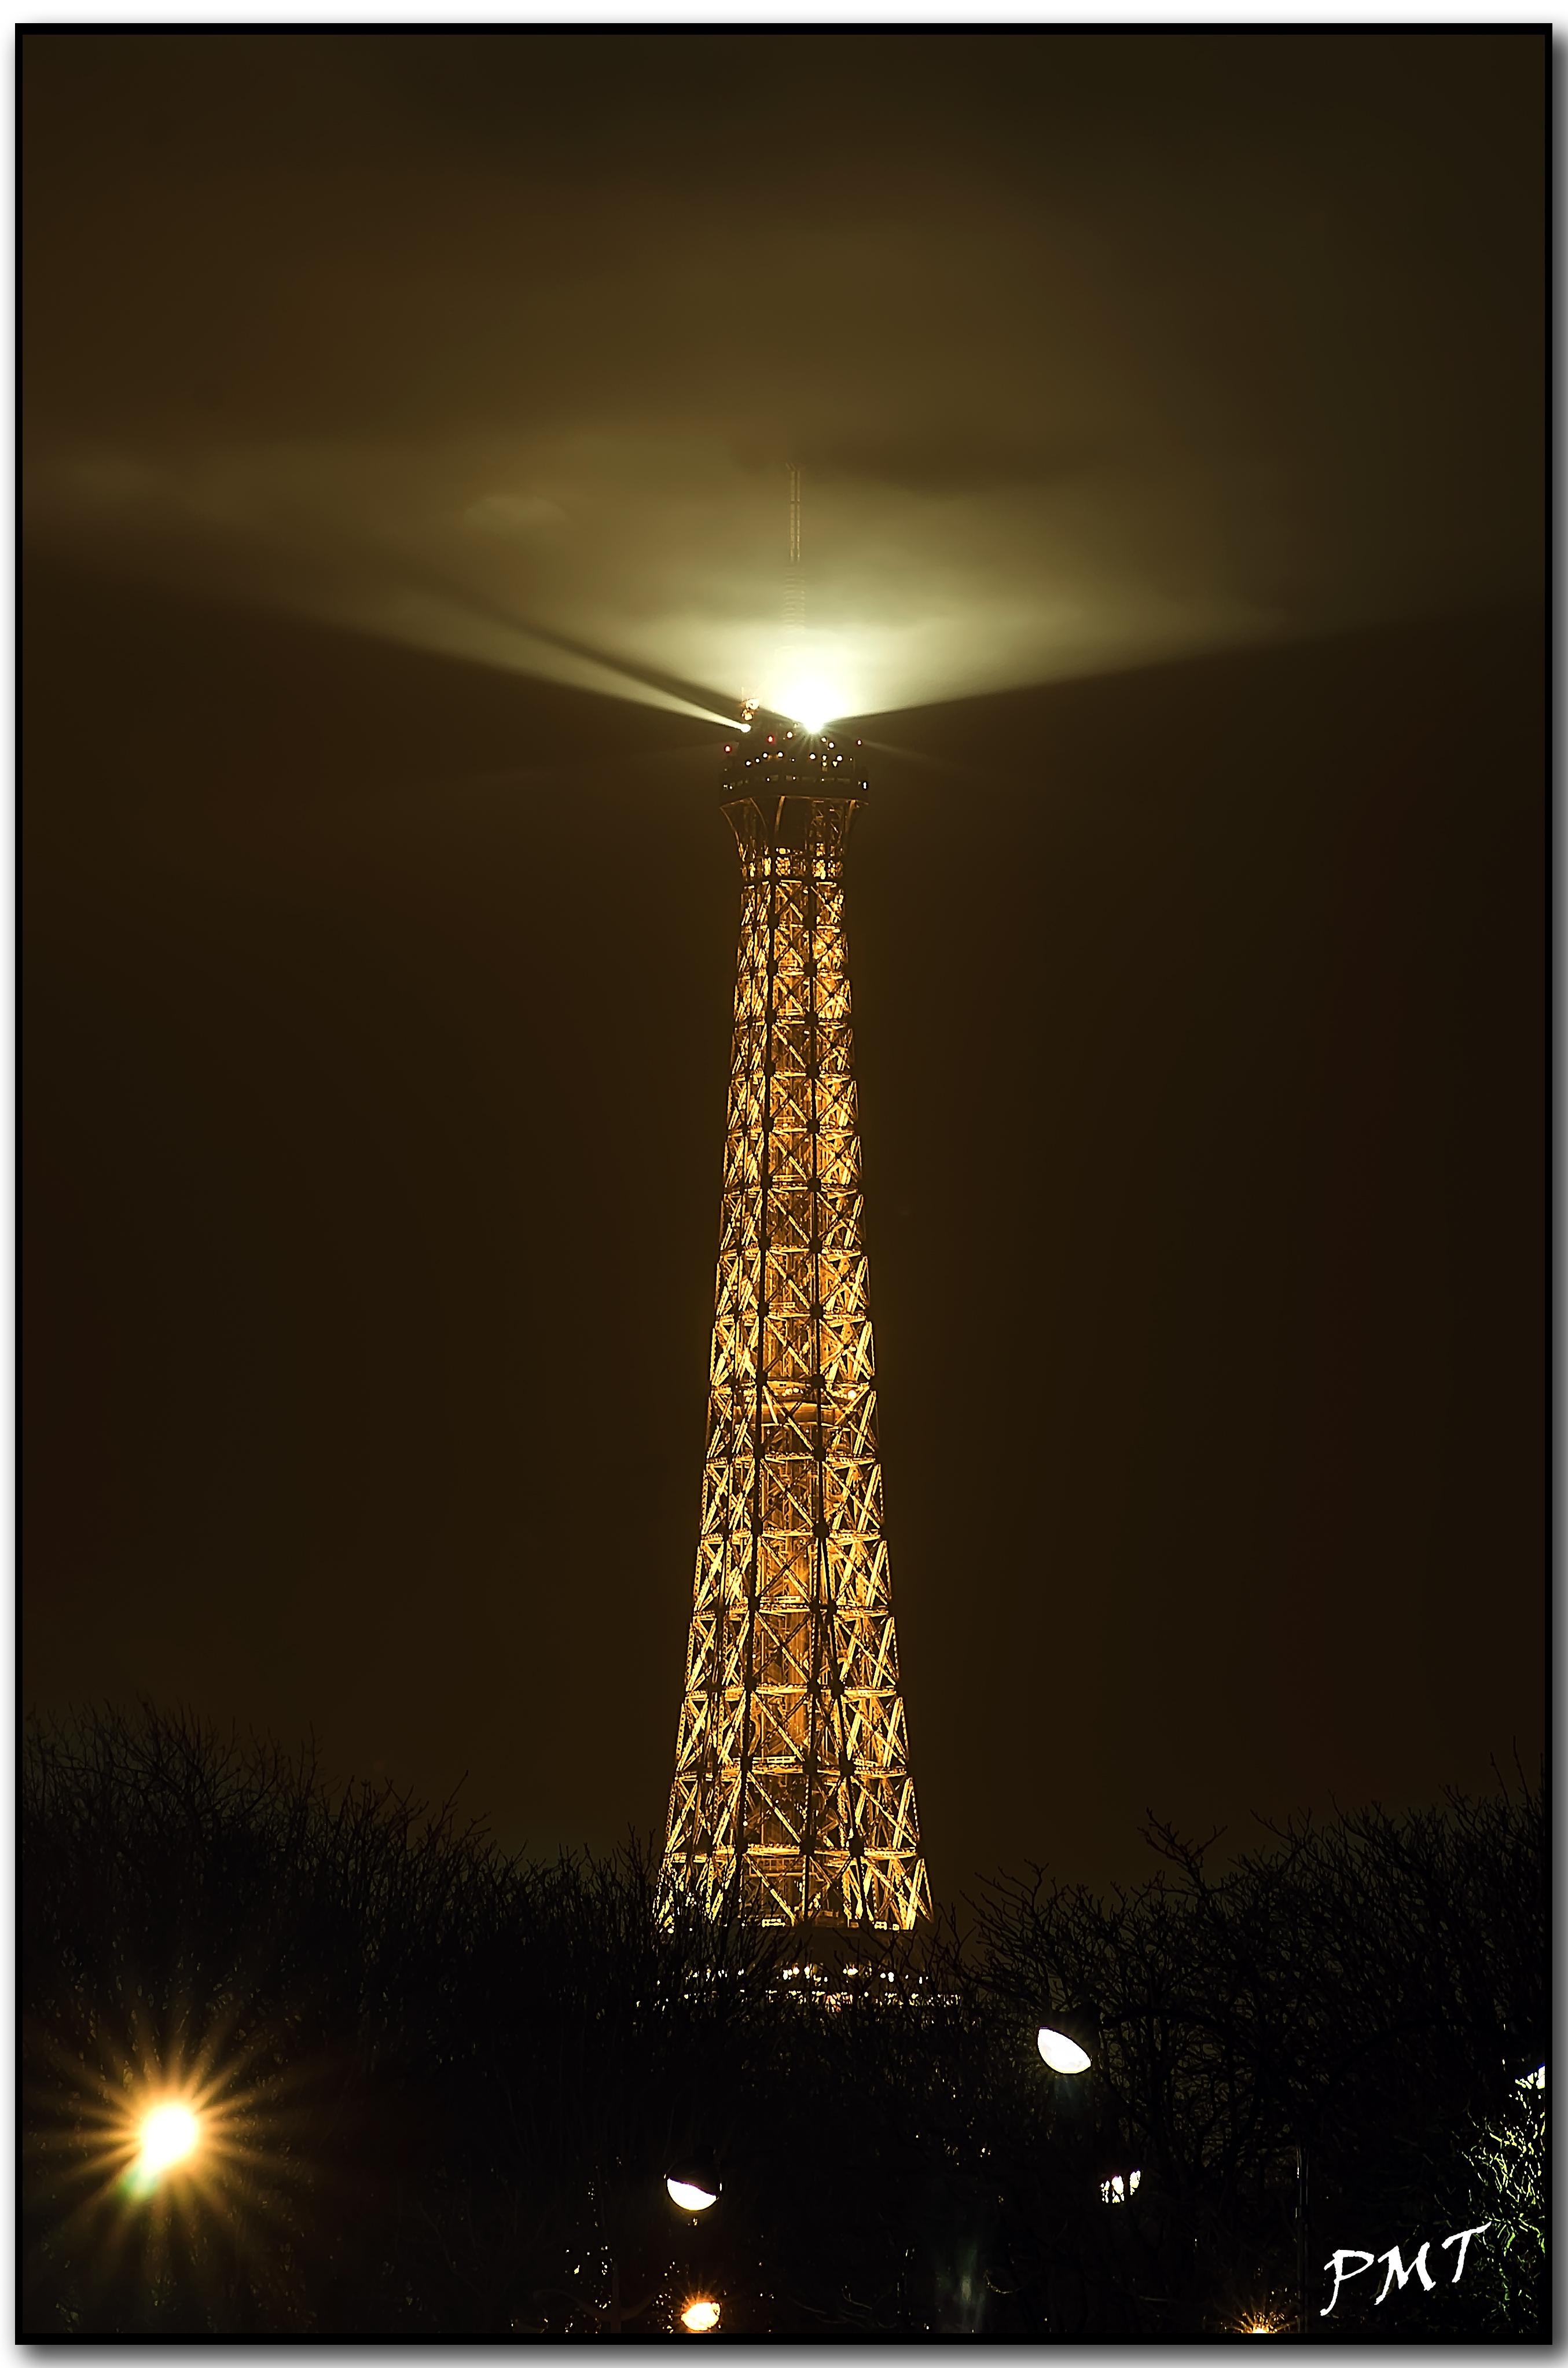 Illuminations de noël - sortie Paris du 30/11 - Page 3 Sortei30111